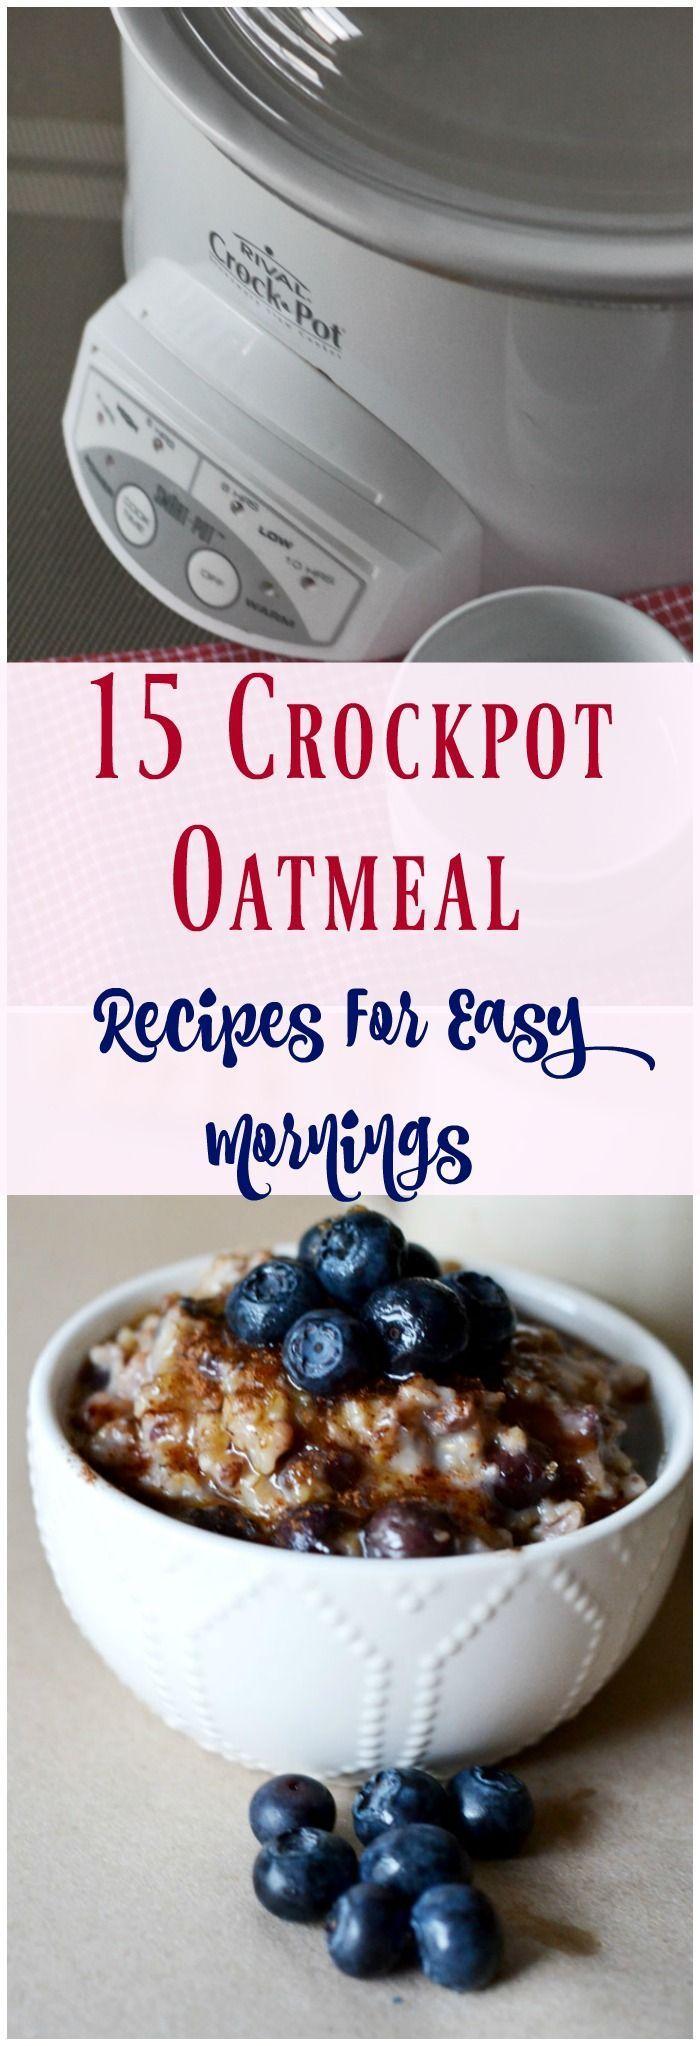 Crockpot Oatmeal: 15 Recipes For Easy Mornings